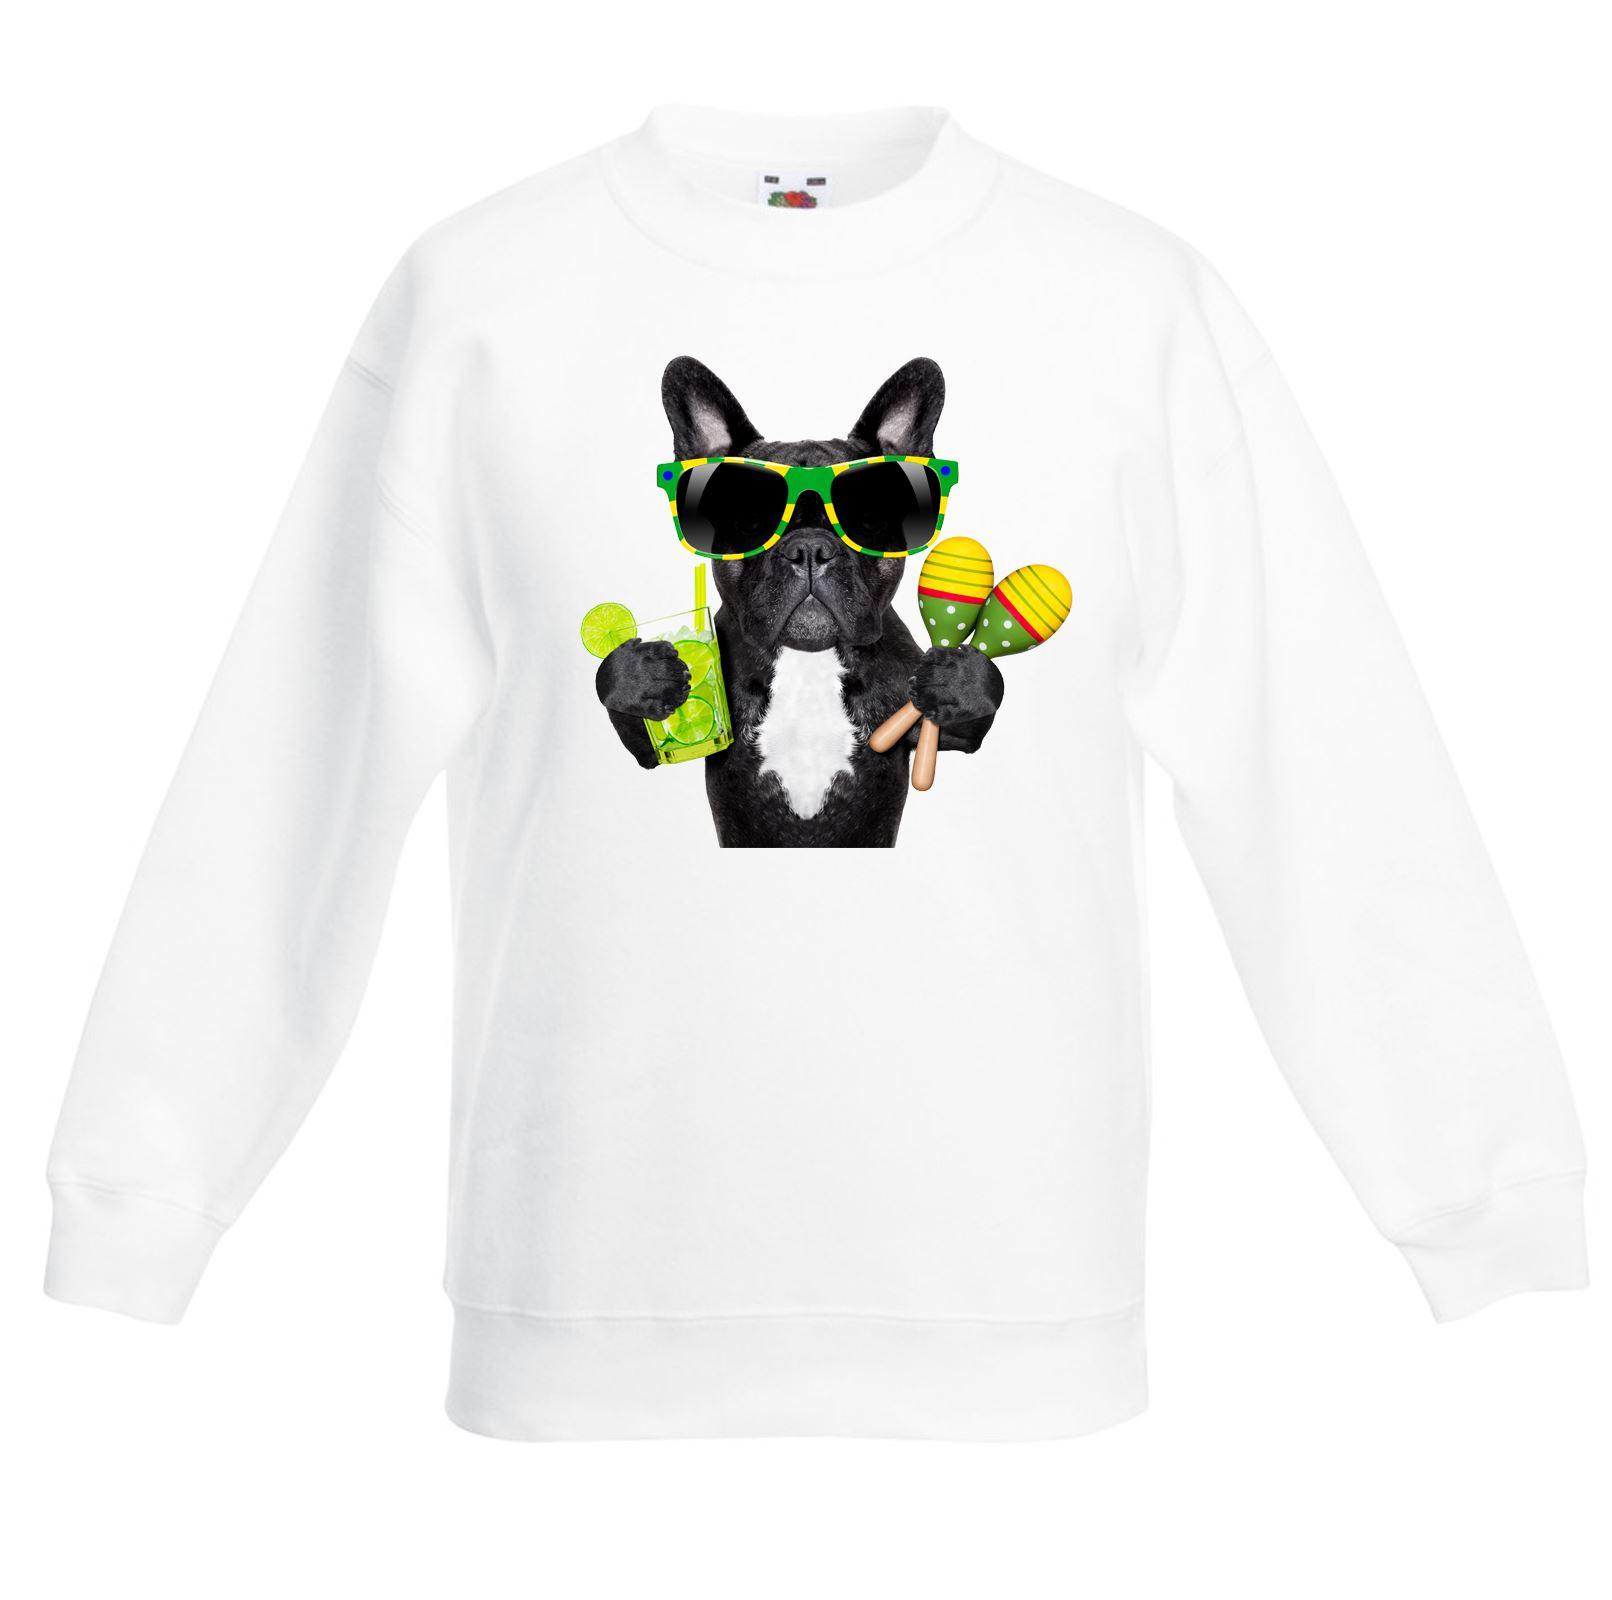 Bonjour Bulldog Face Dog Puppy Funny Kids Childrens T-Shirt tee TShirt